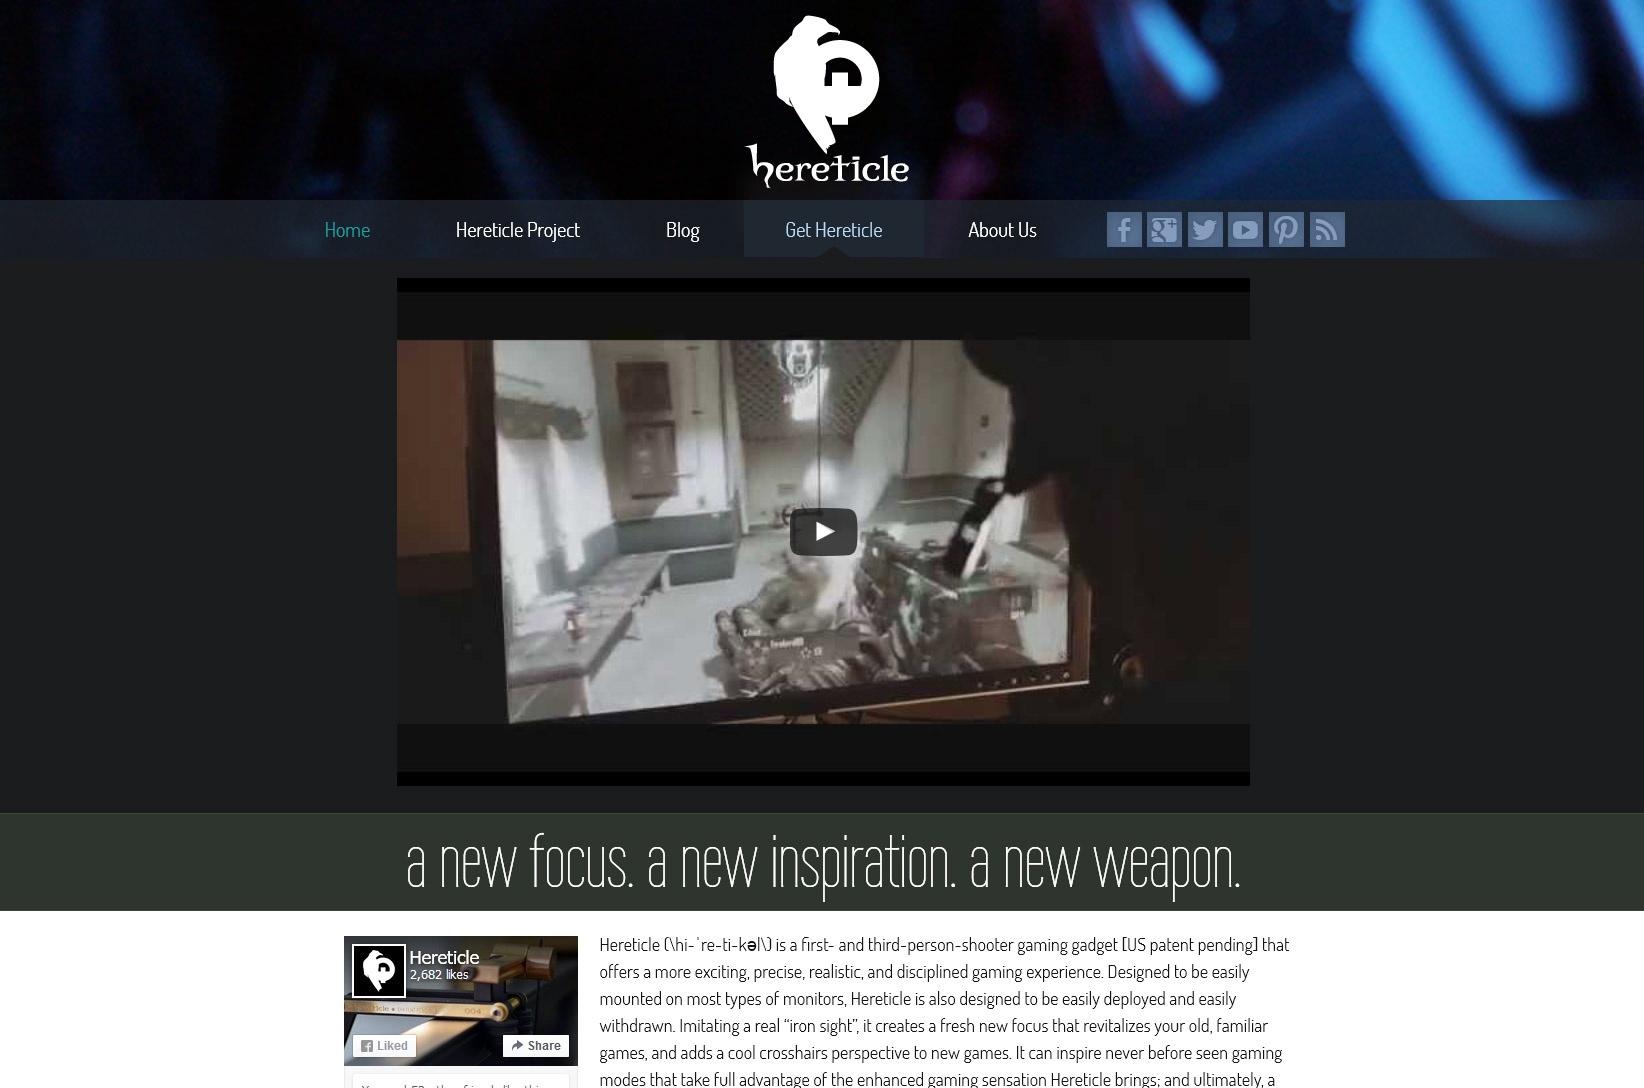 Hereticle: Homepage